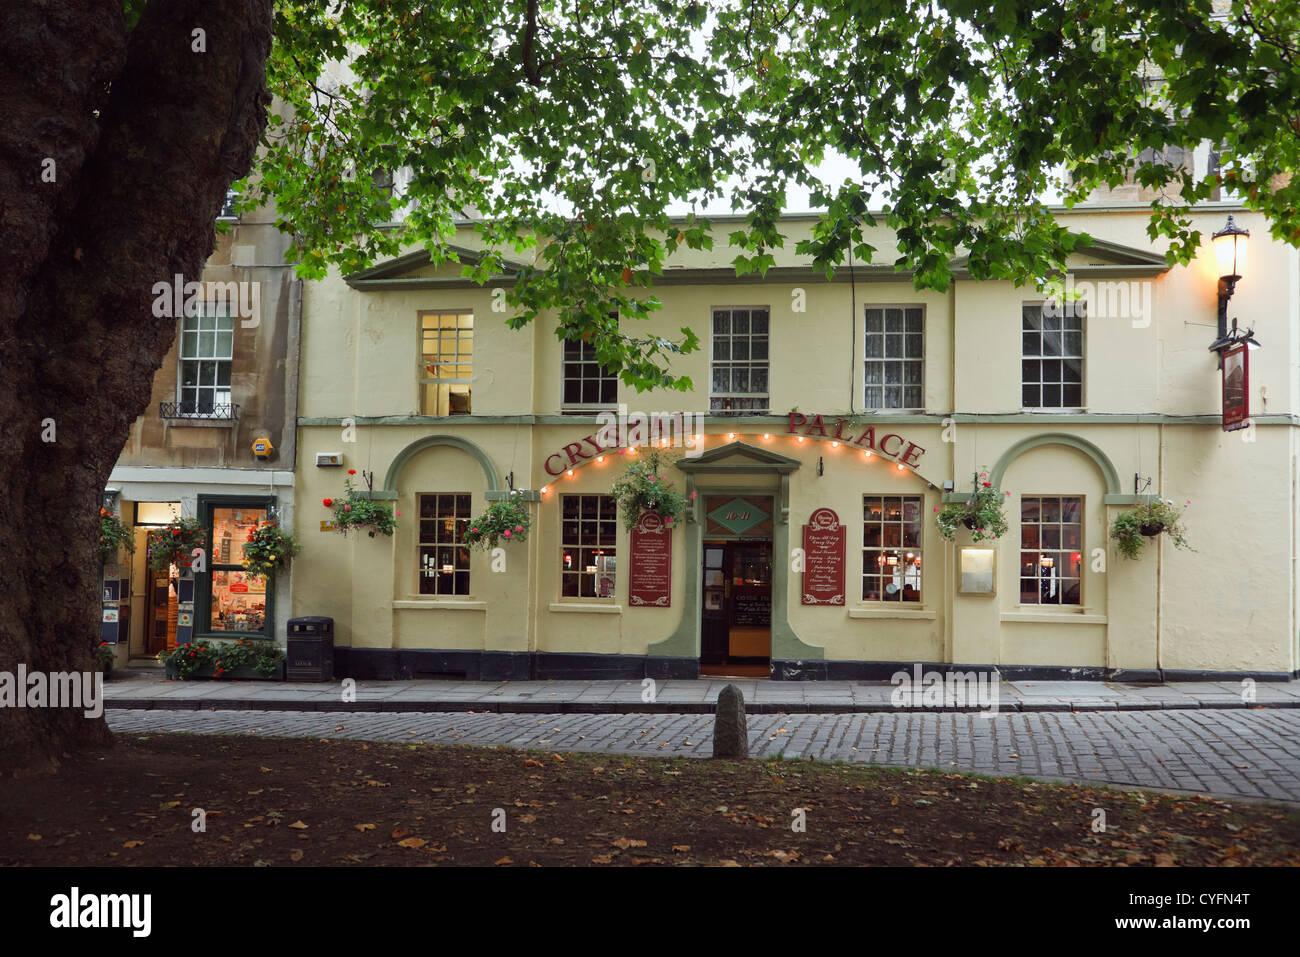 Crystal Palace pub 1780 and Plane tree (Platanus acerifolia) in Abbey Green, Bath, Somerset, England, UK, Britain - Stock Image